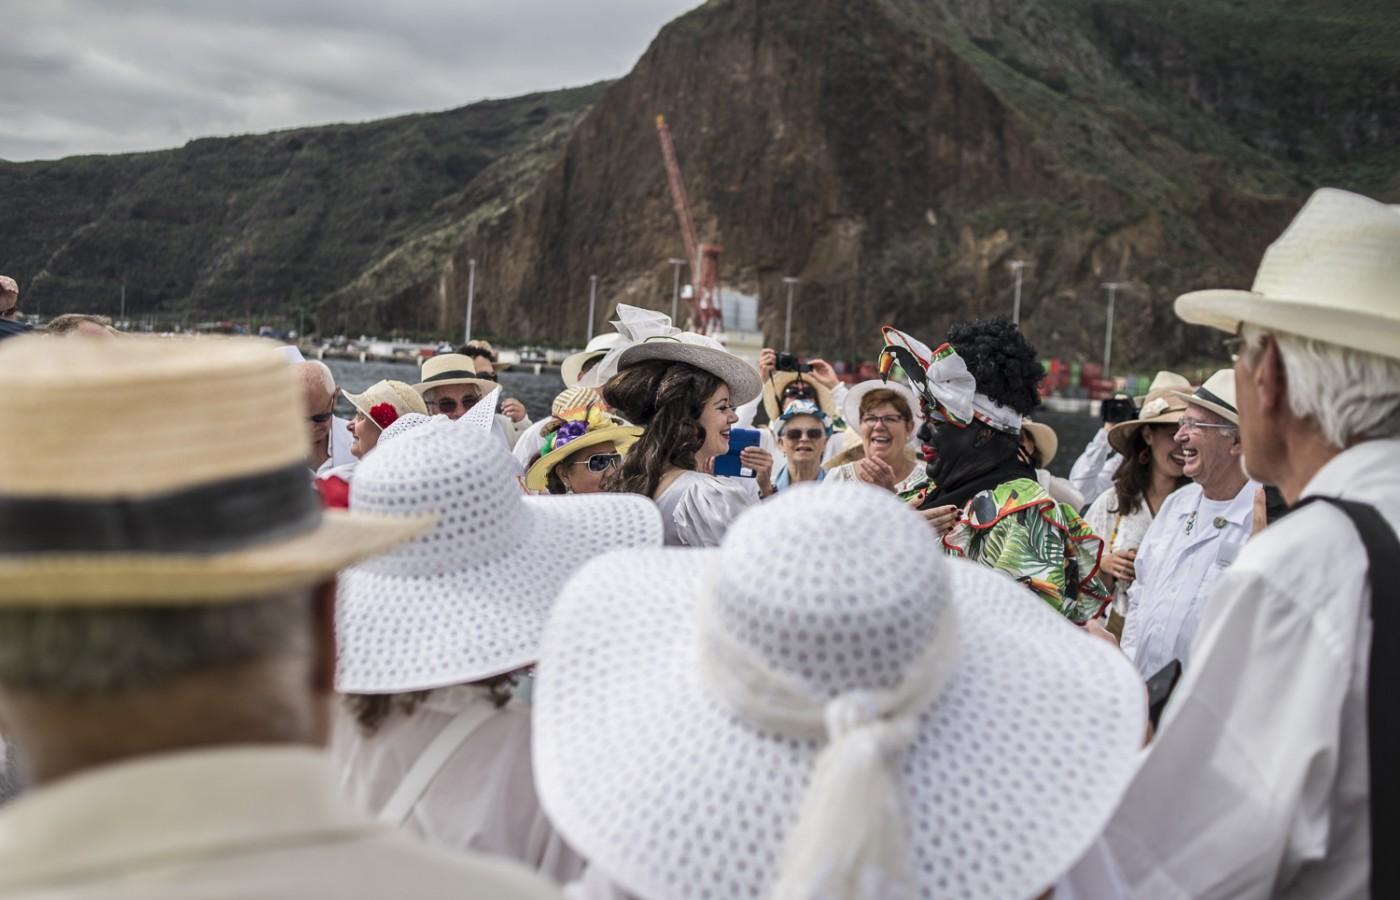 Indianos de La Palma 2016. Apoteosis isleña © Selu Vega